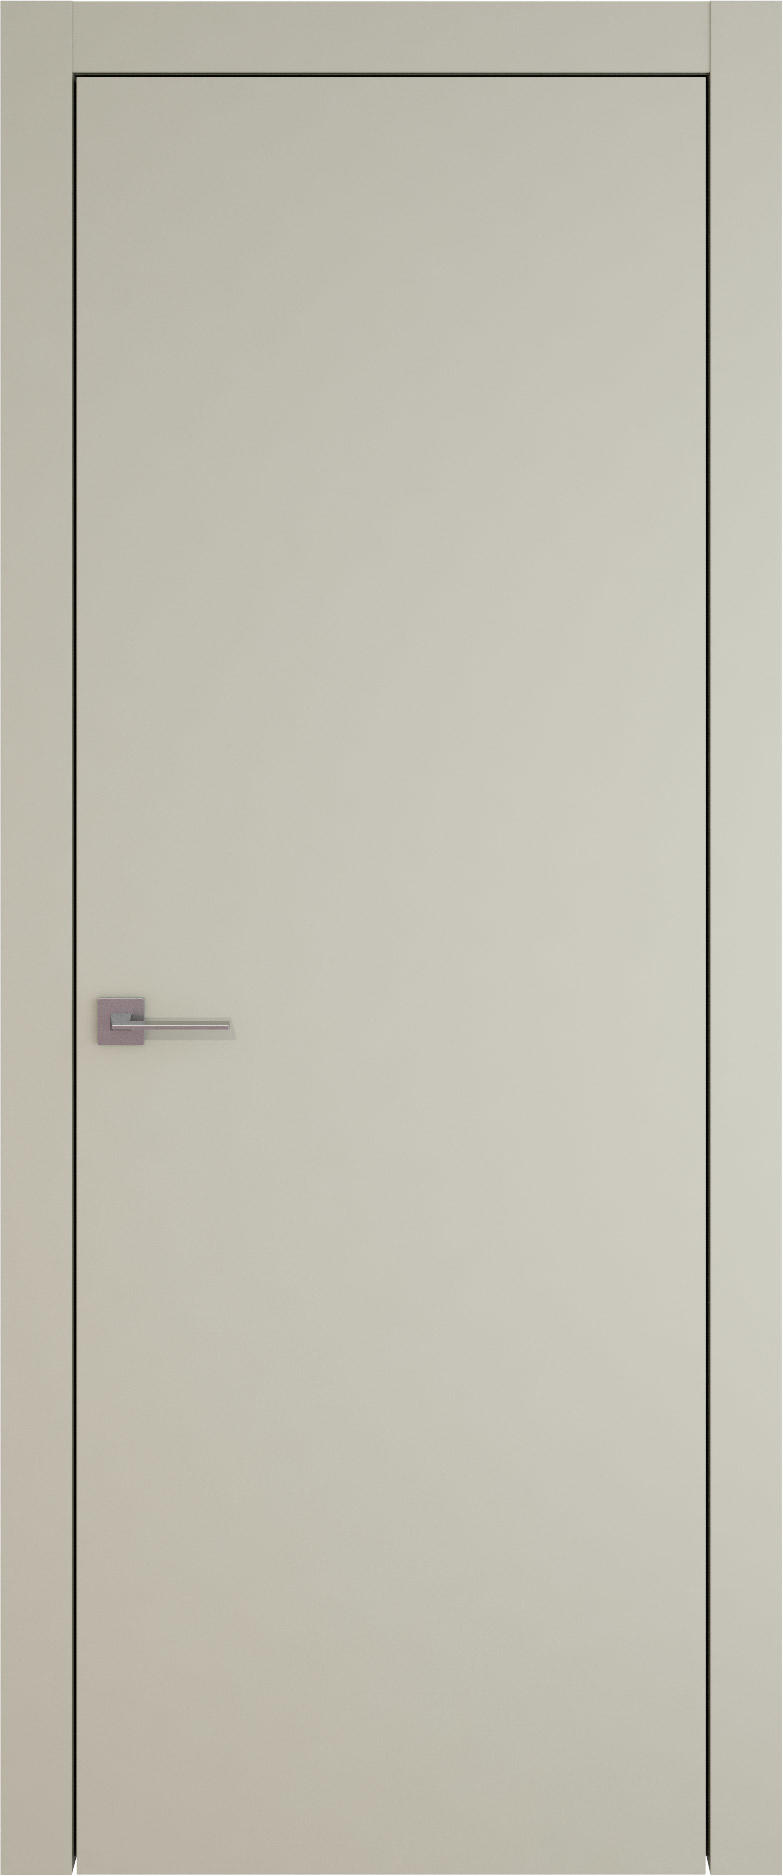 Tivoli А-1 цвет - Серо-оливковая эмаль (RAL 7032) Без стекла (ДГ)